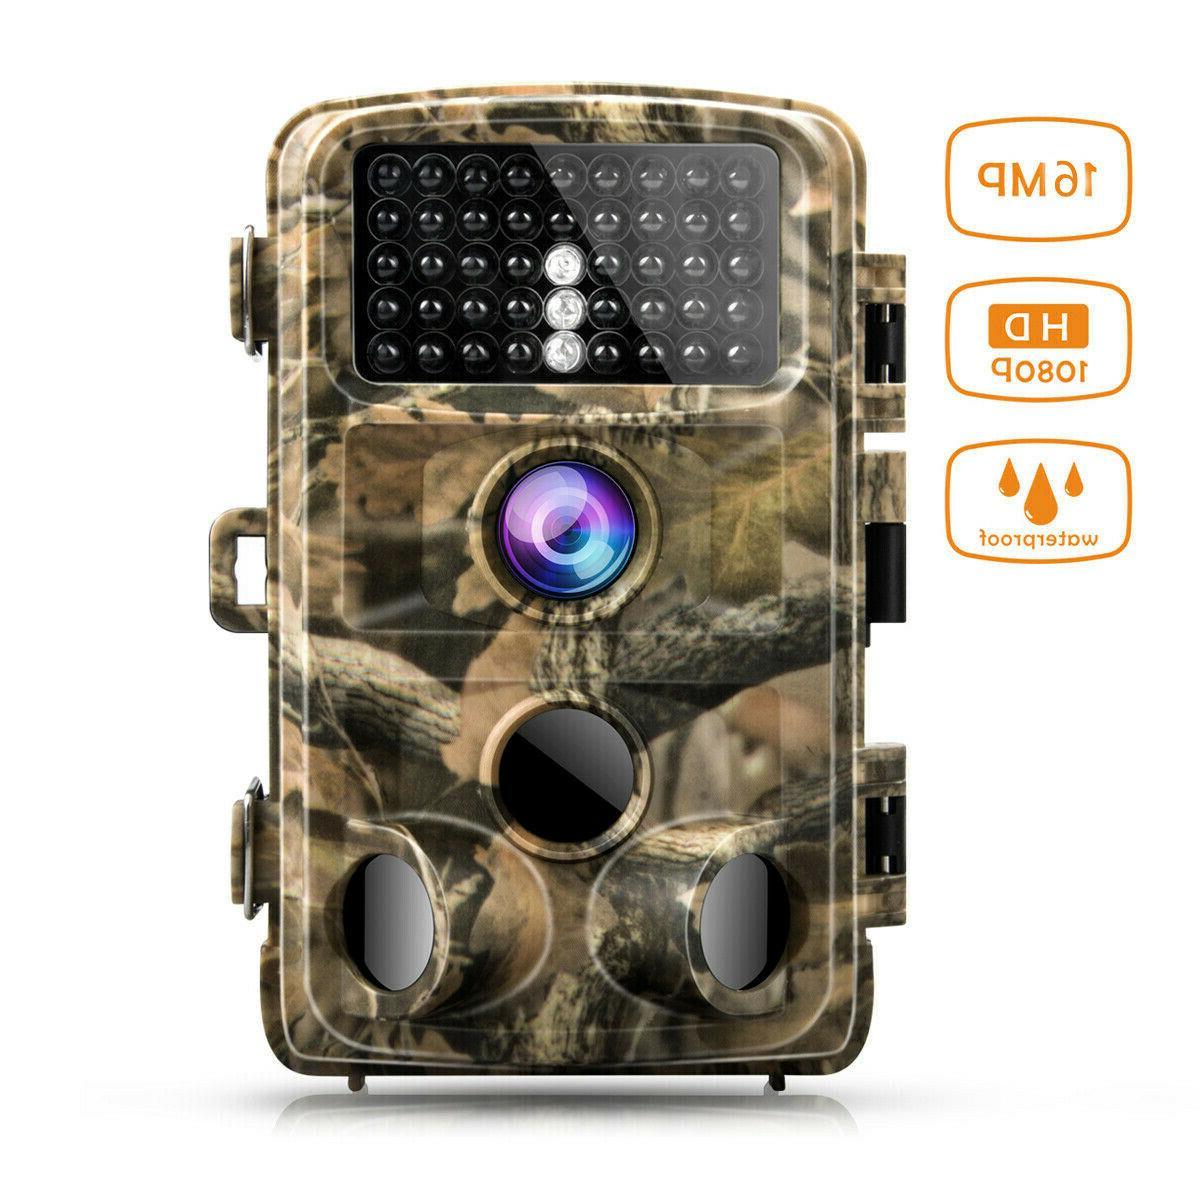 trail hunting camera 14mp fhd 1080p waterproof